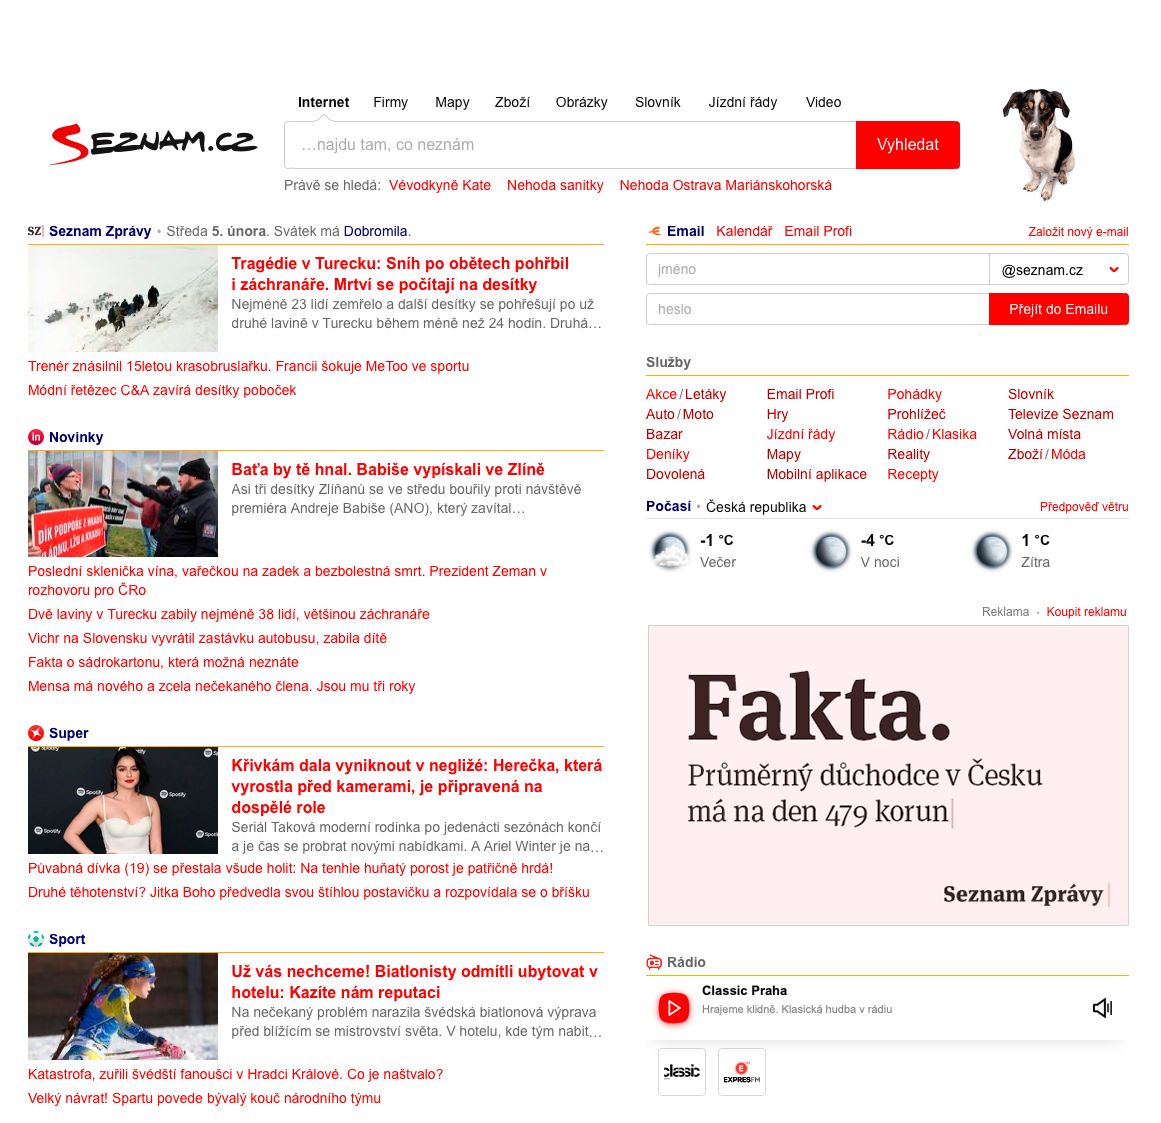 Seznam.cz: Fakta